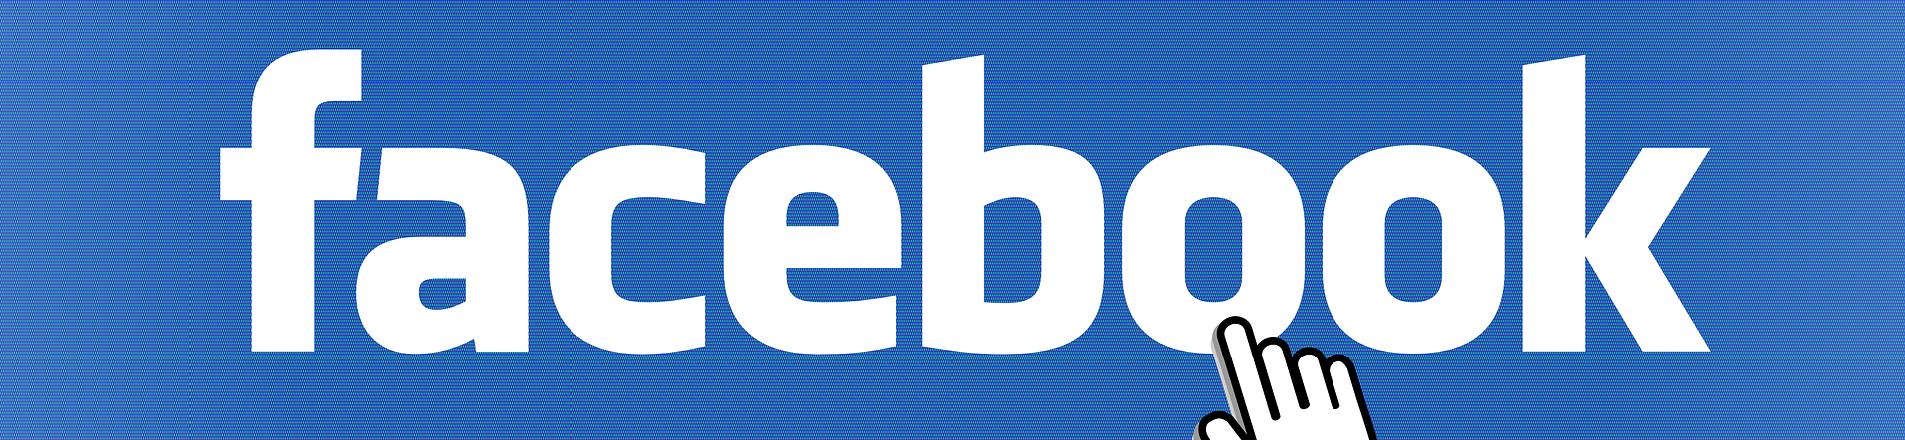 Executive of Facebook criticizes diversity gap